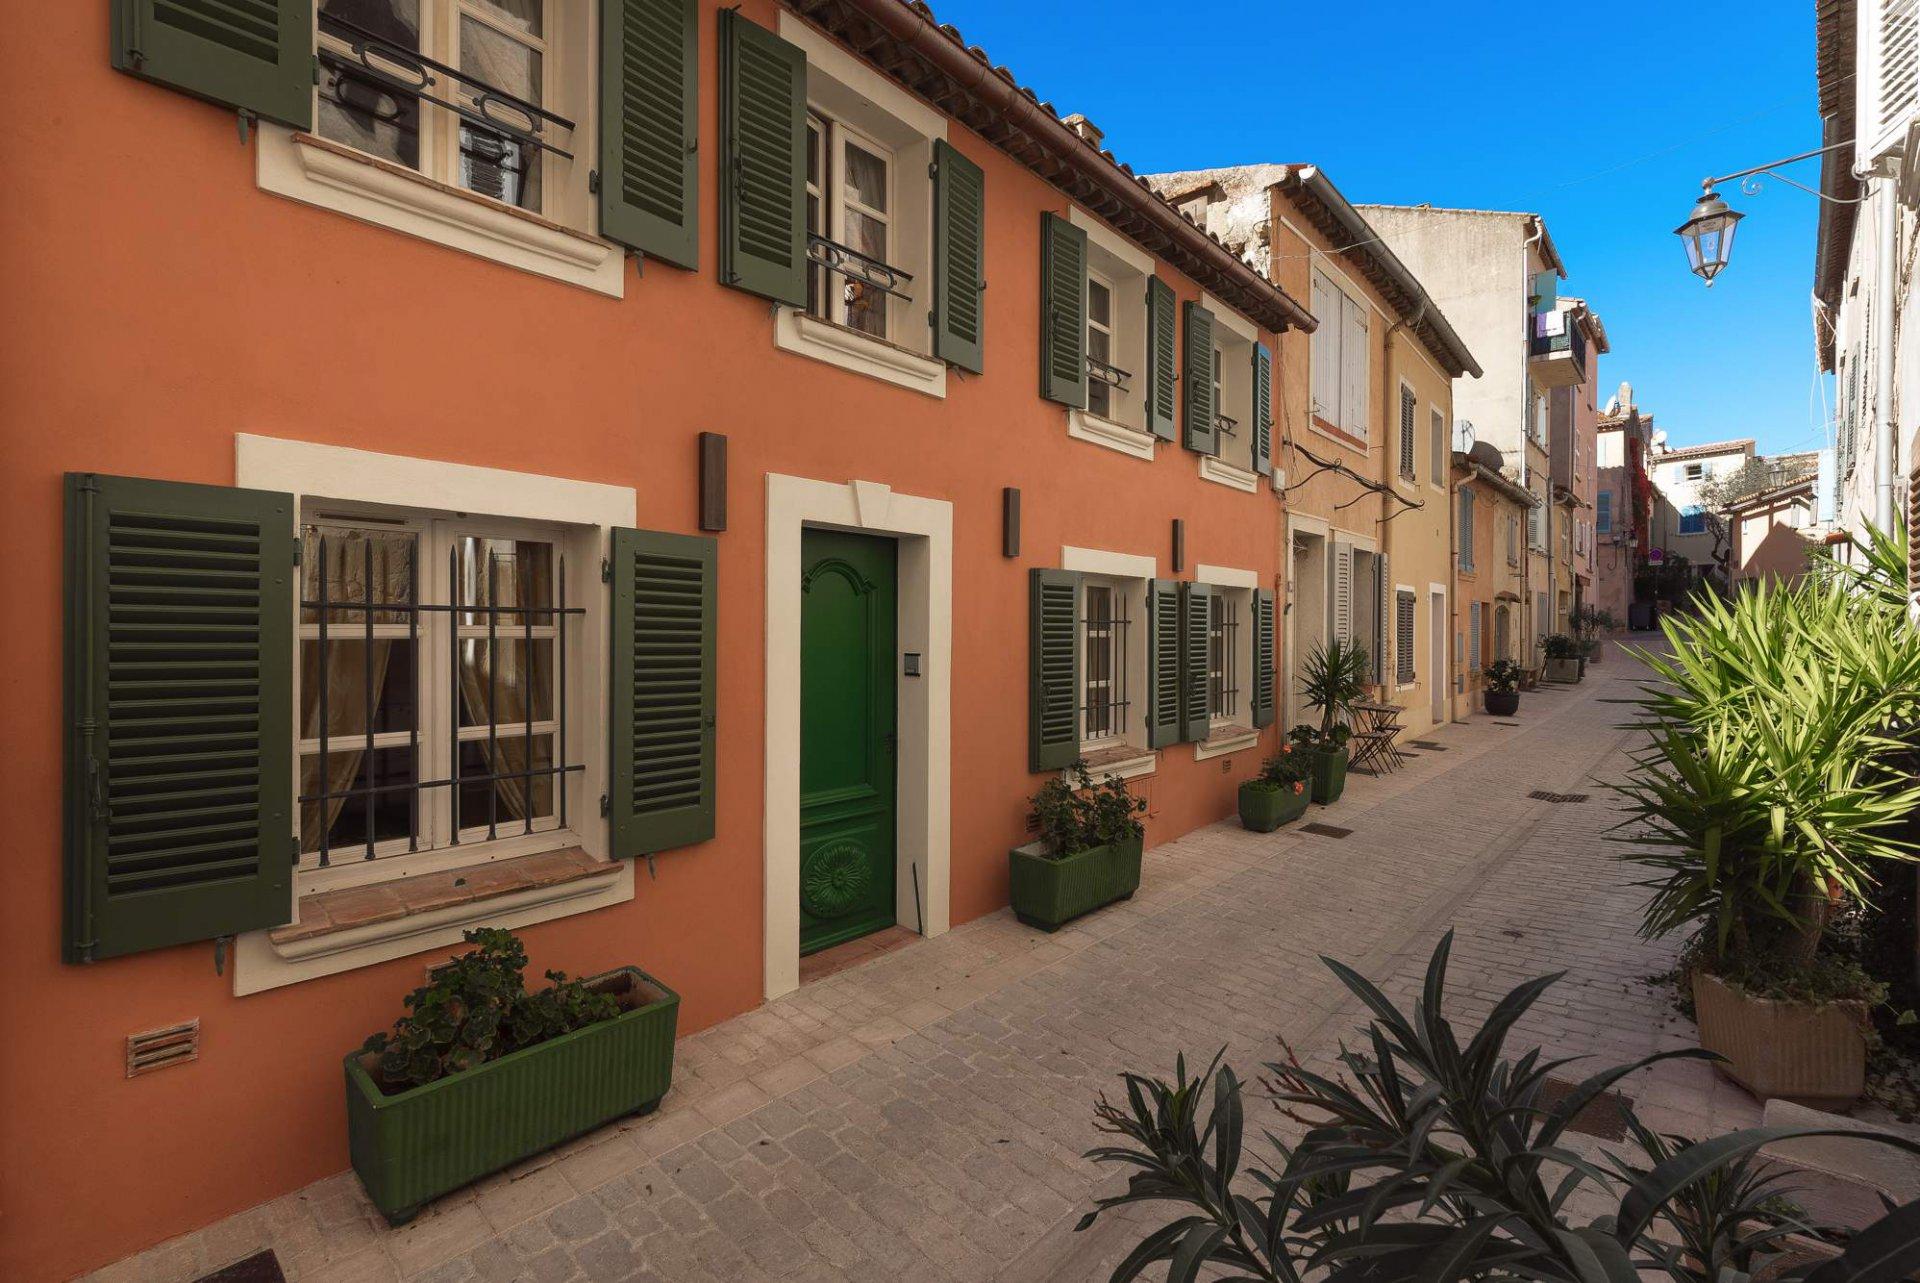 Sea side town house Saint-Tropez Var Provence